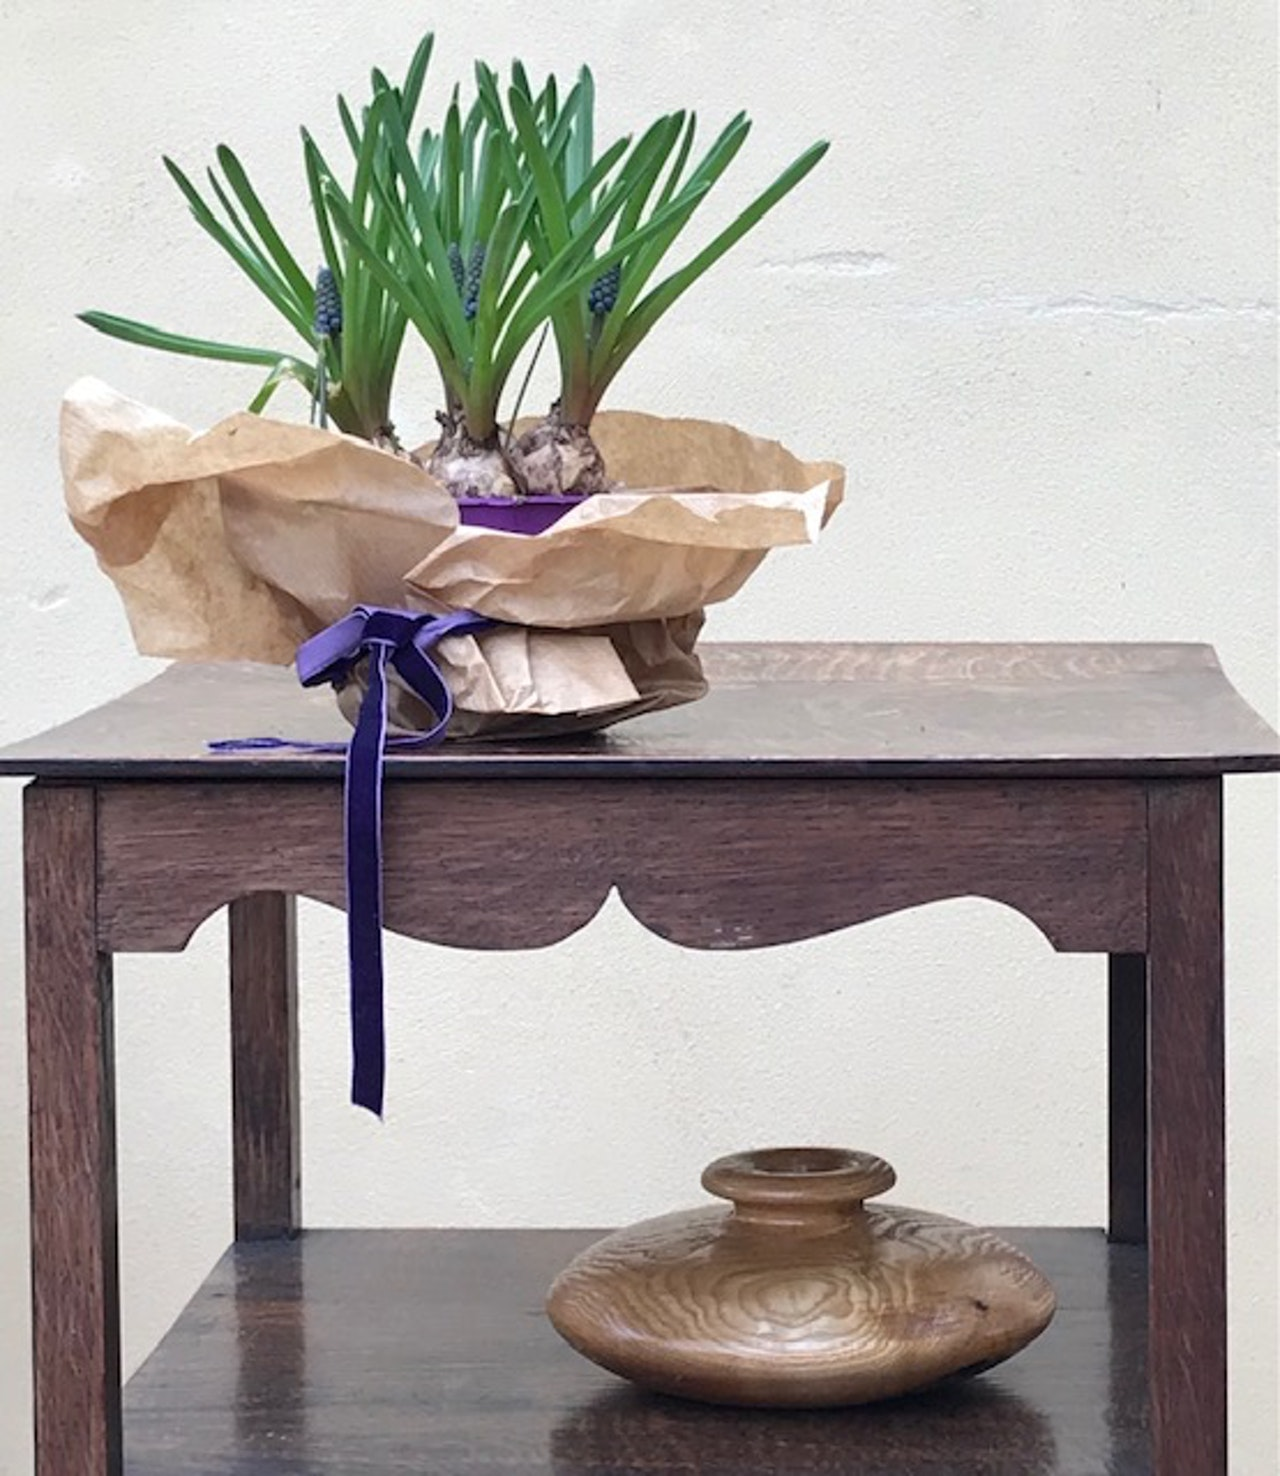 Lesson 8 Grape Hyacinths